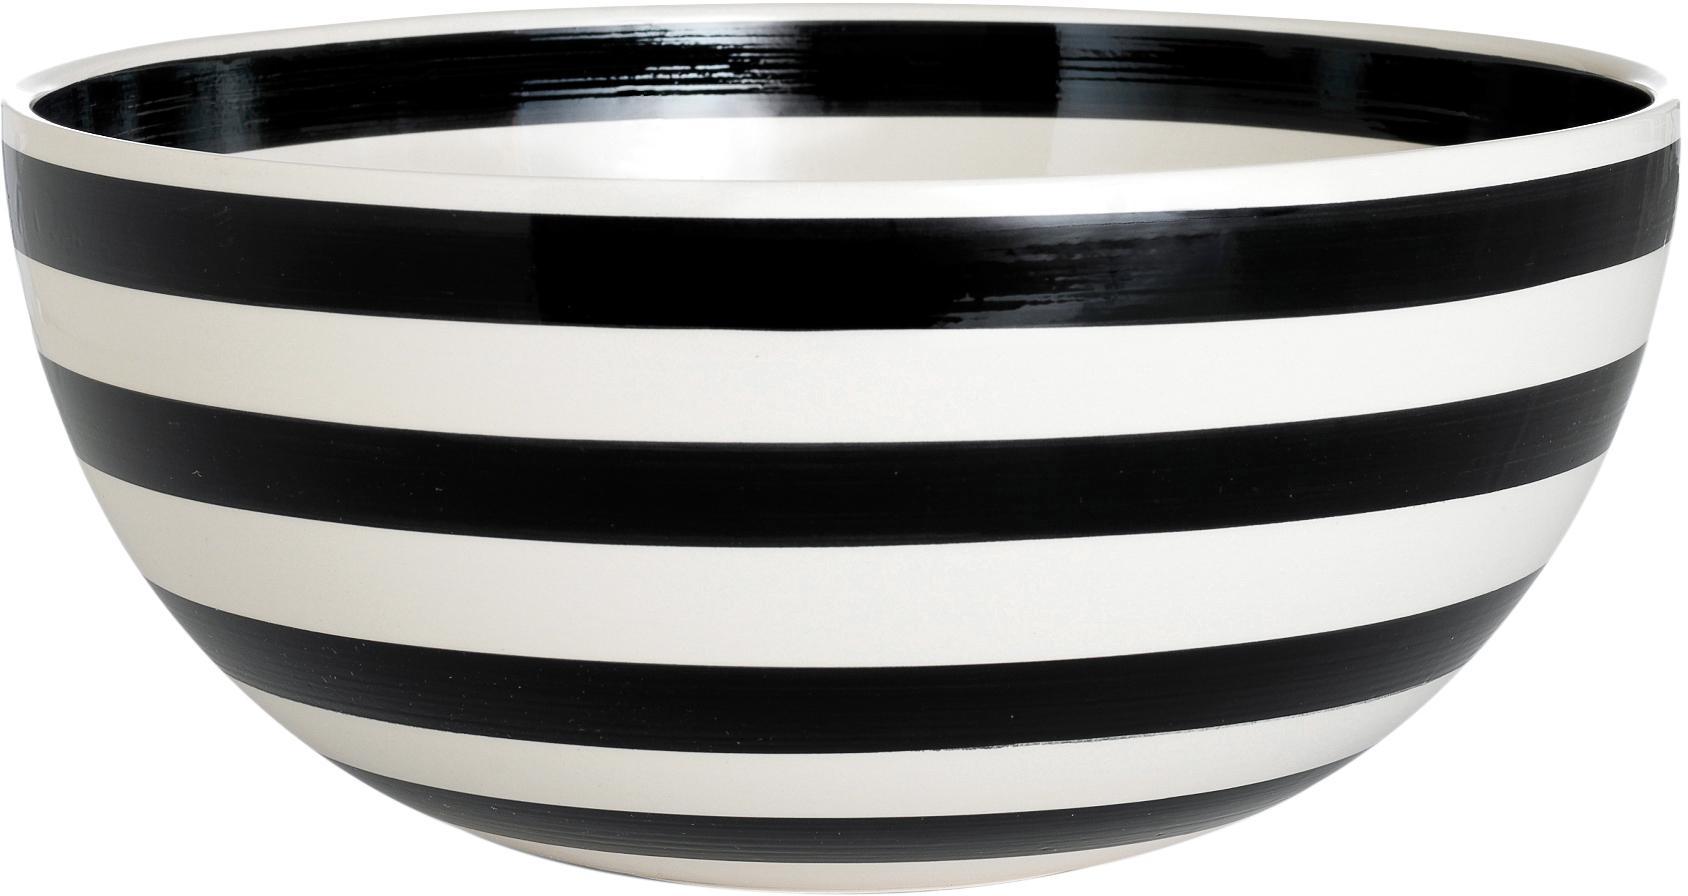 Schaal Omaggio, Keramiek, Zwart, wit, Ø 30 x H 14 cm